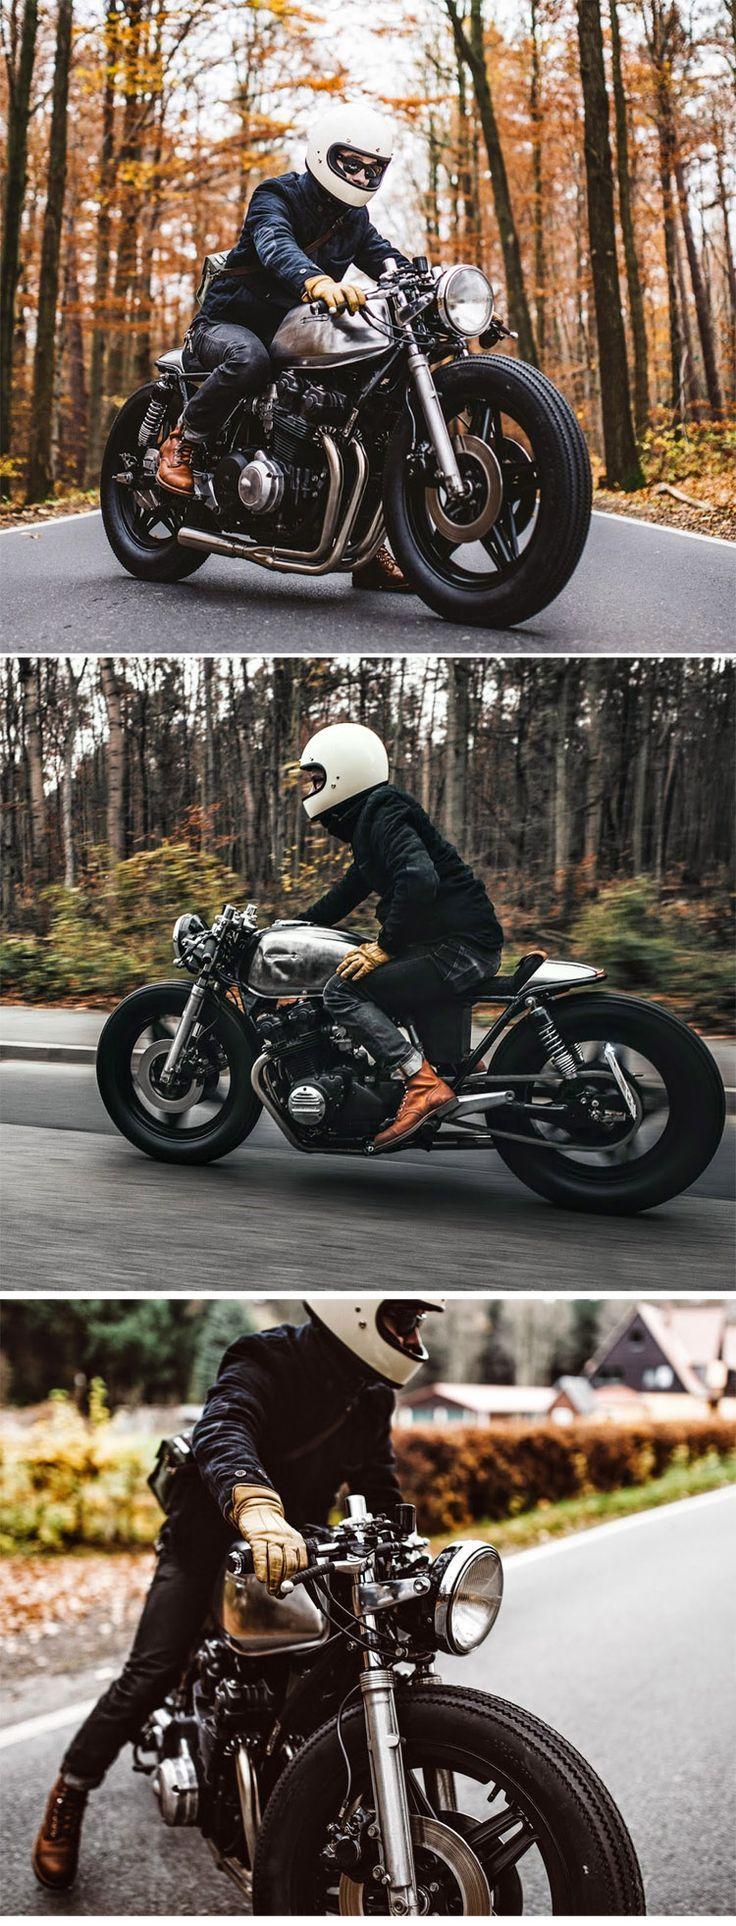 a98525d08b3e02b88e24dfa5836128e1 best 25 honda motorcycle accessories ideas on pinterest cafe  at bayanpartner.co